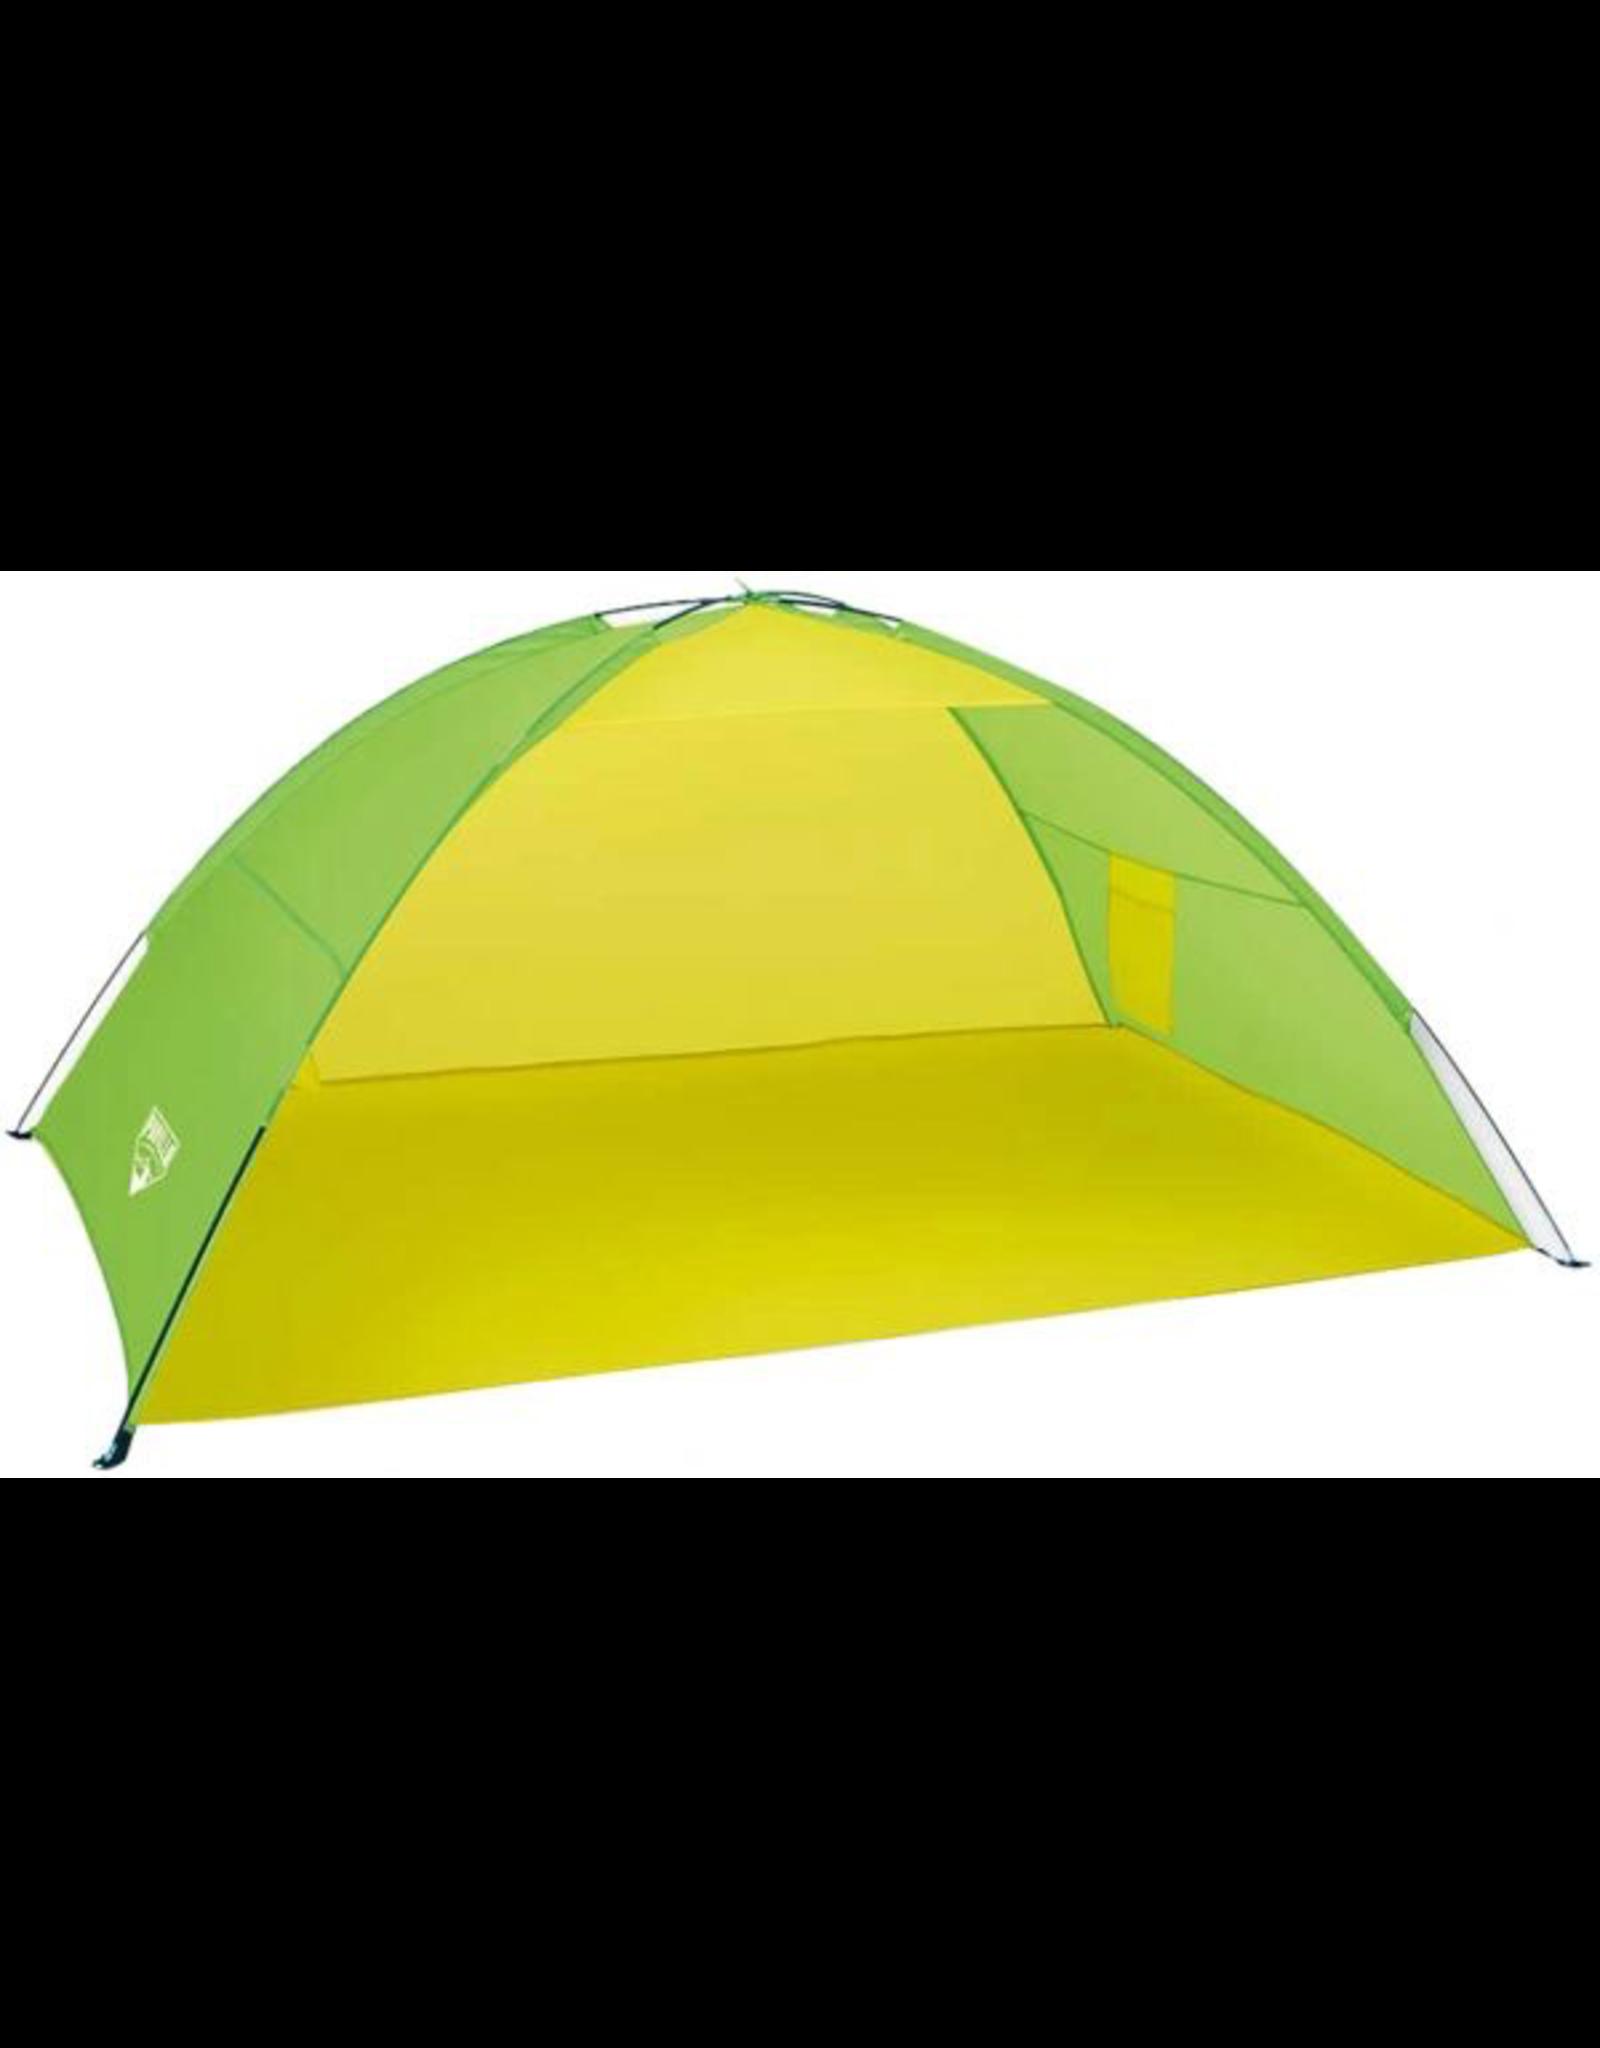 Bestway Beach Tent 2.0m x 1.3m x 90cm